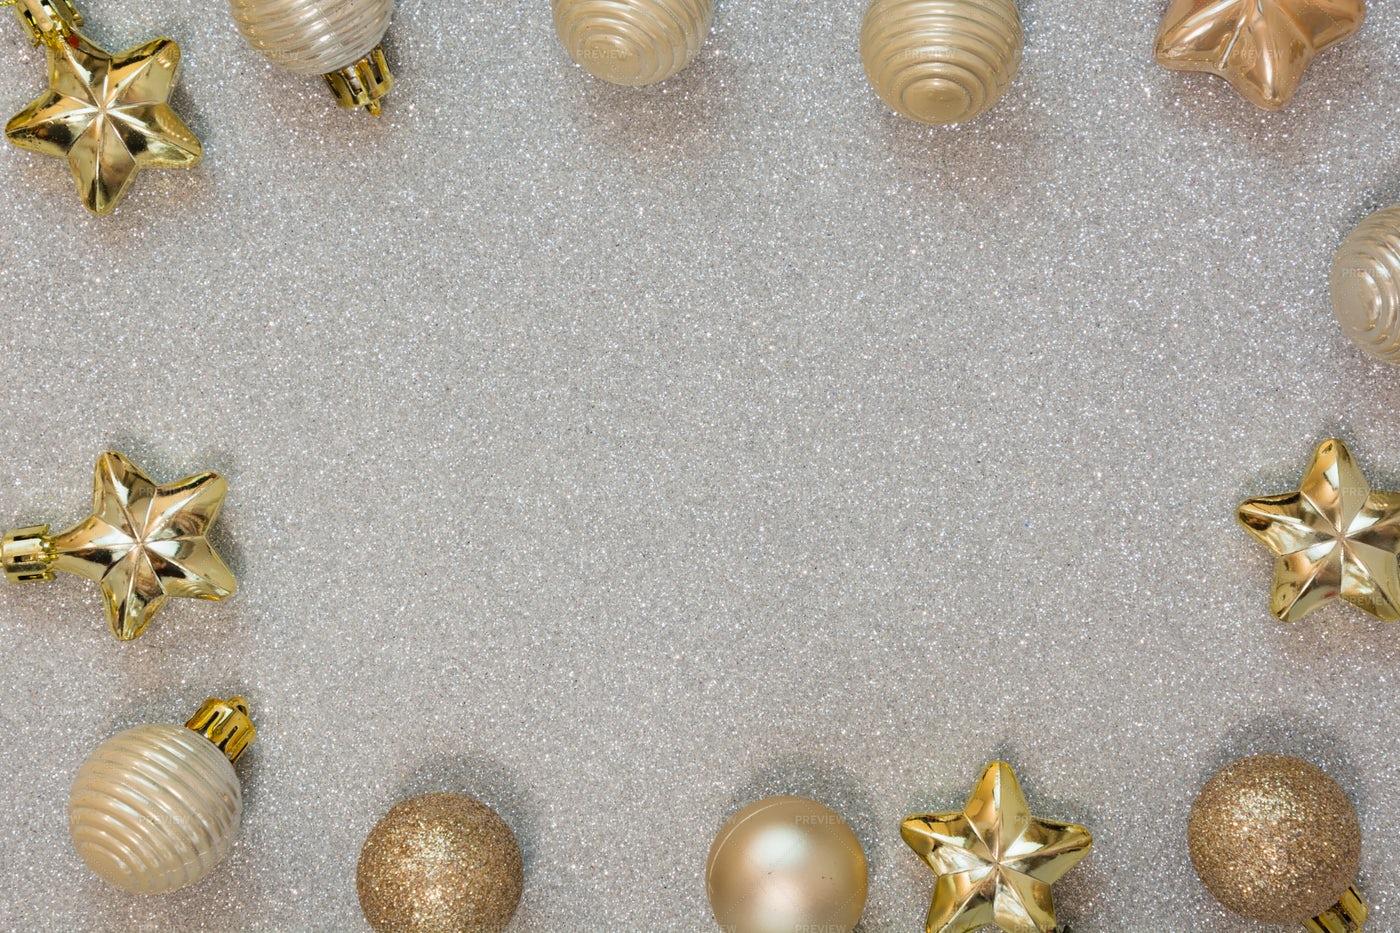 Christmas Frame: Stock Photos